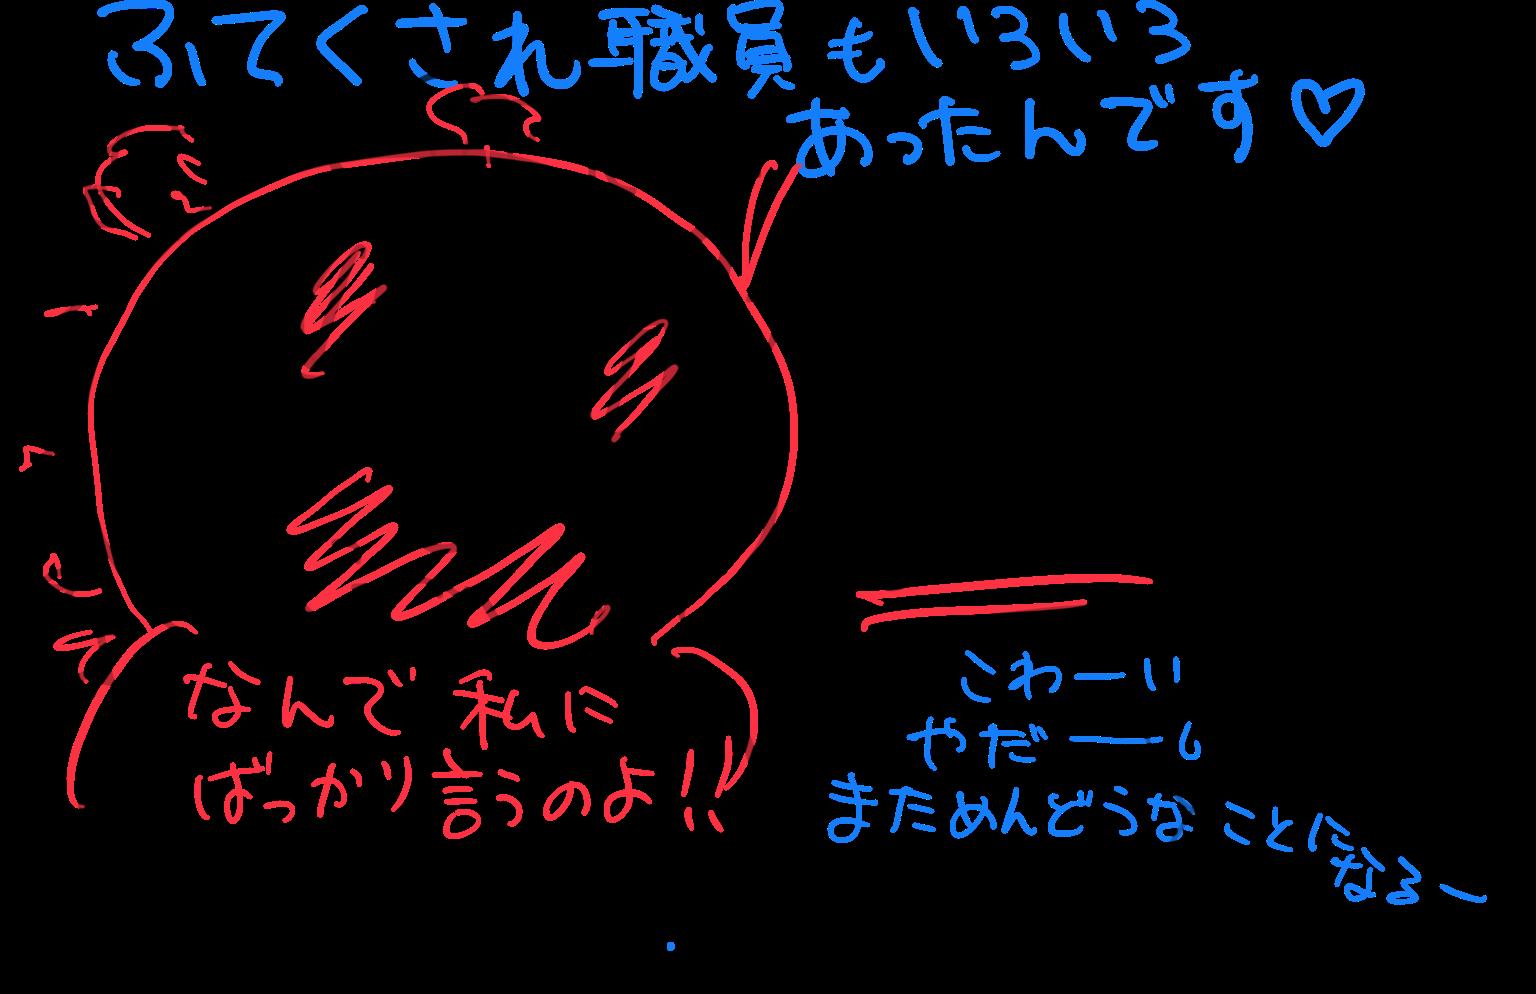 9BFB7688-8D41-43D2-A84E-1A02588EE99E